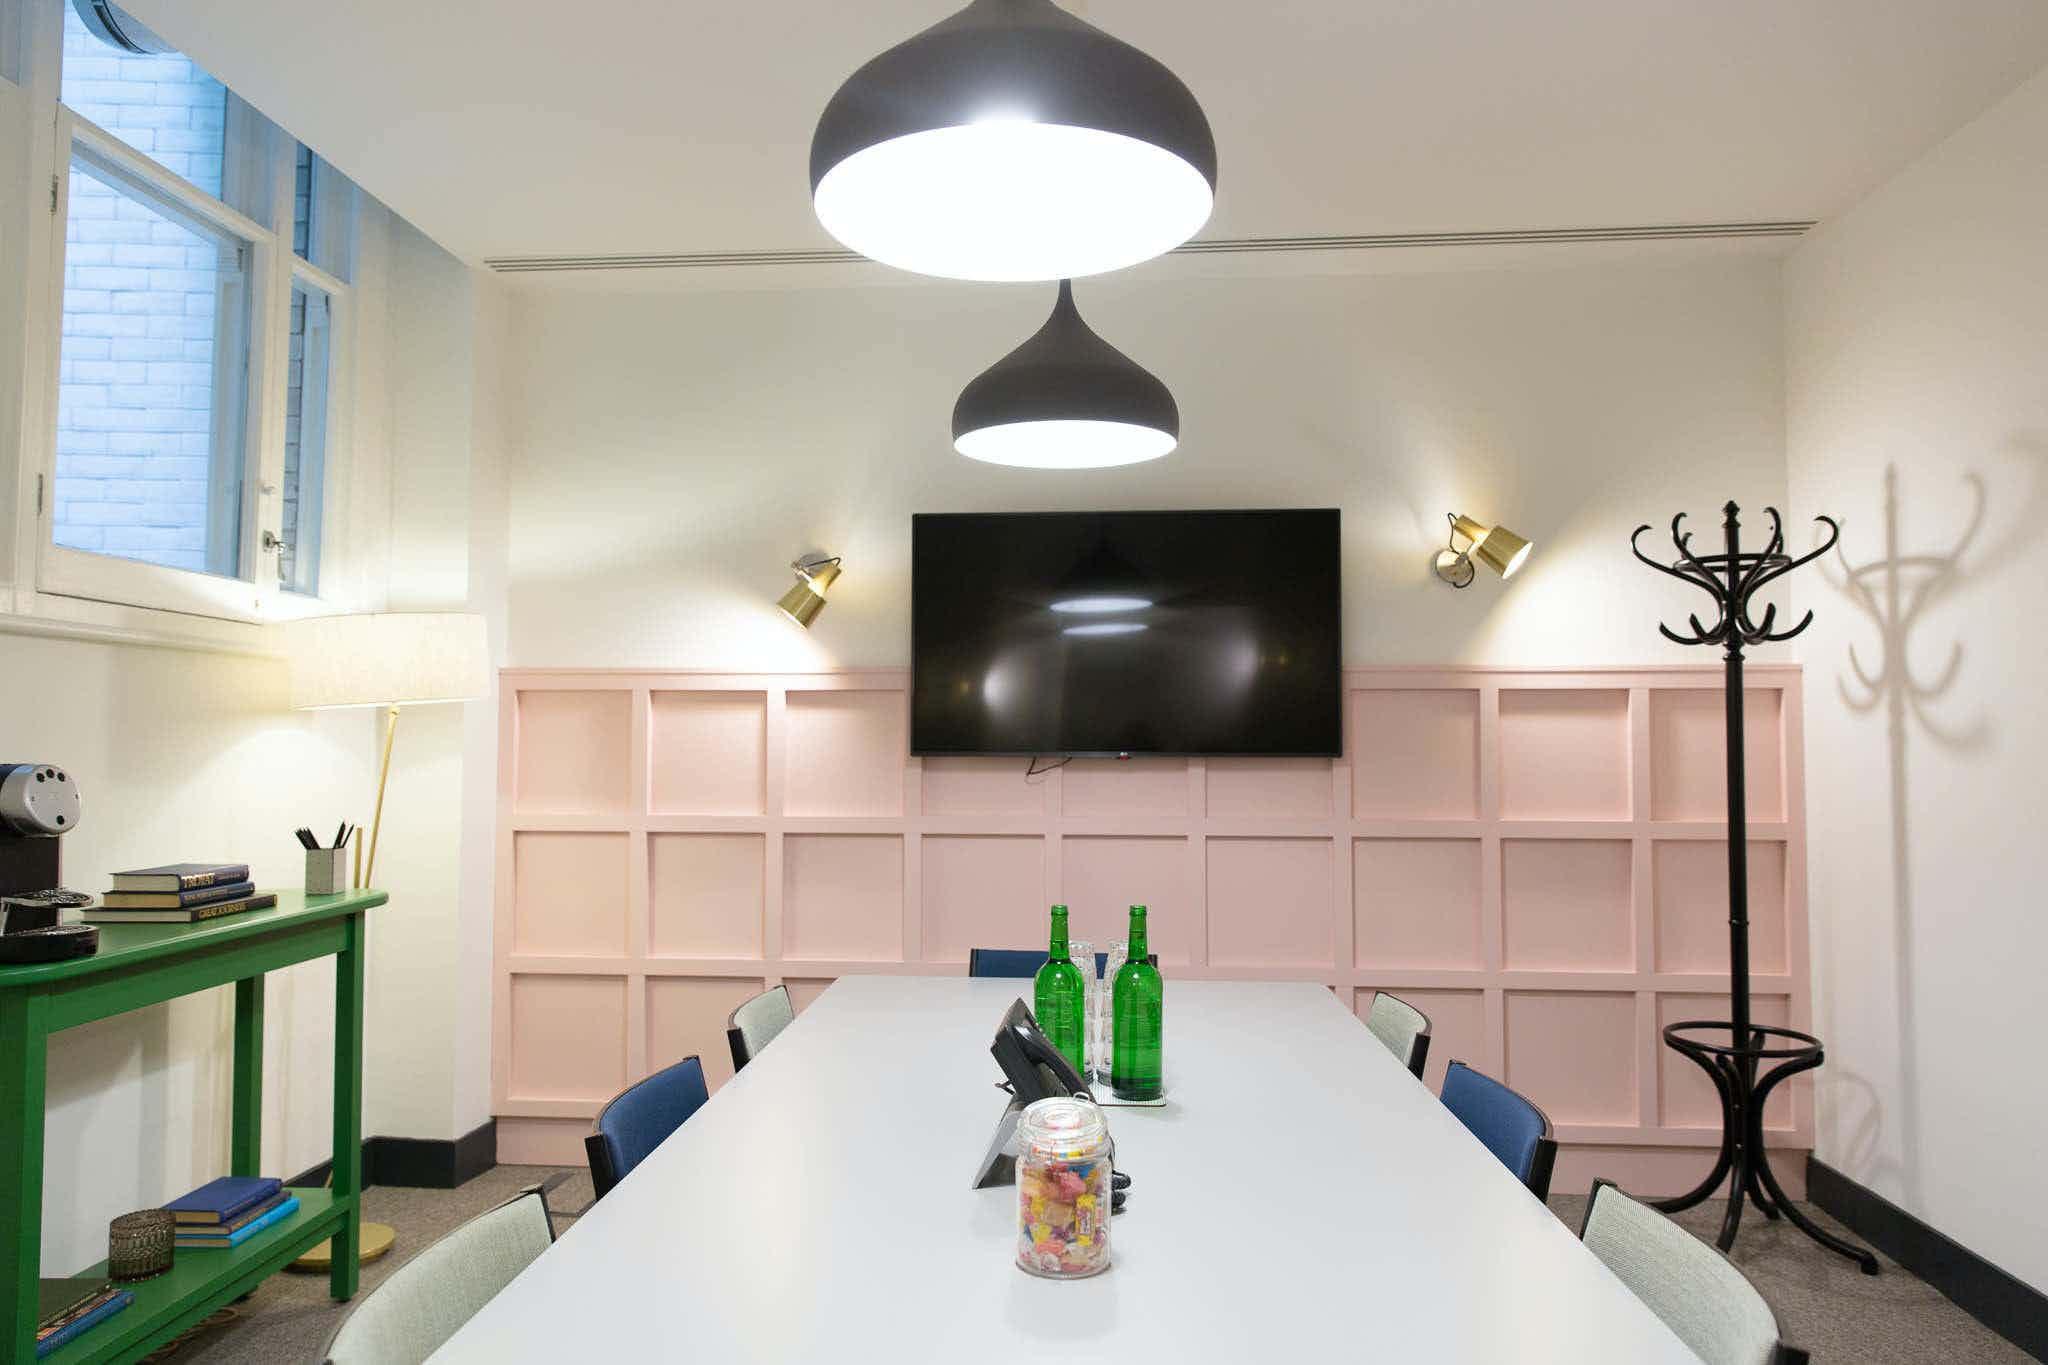 Meeting Room 10 , TOG, Warnford Court